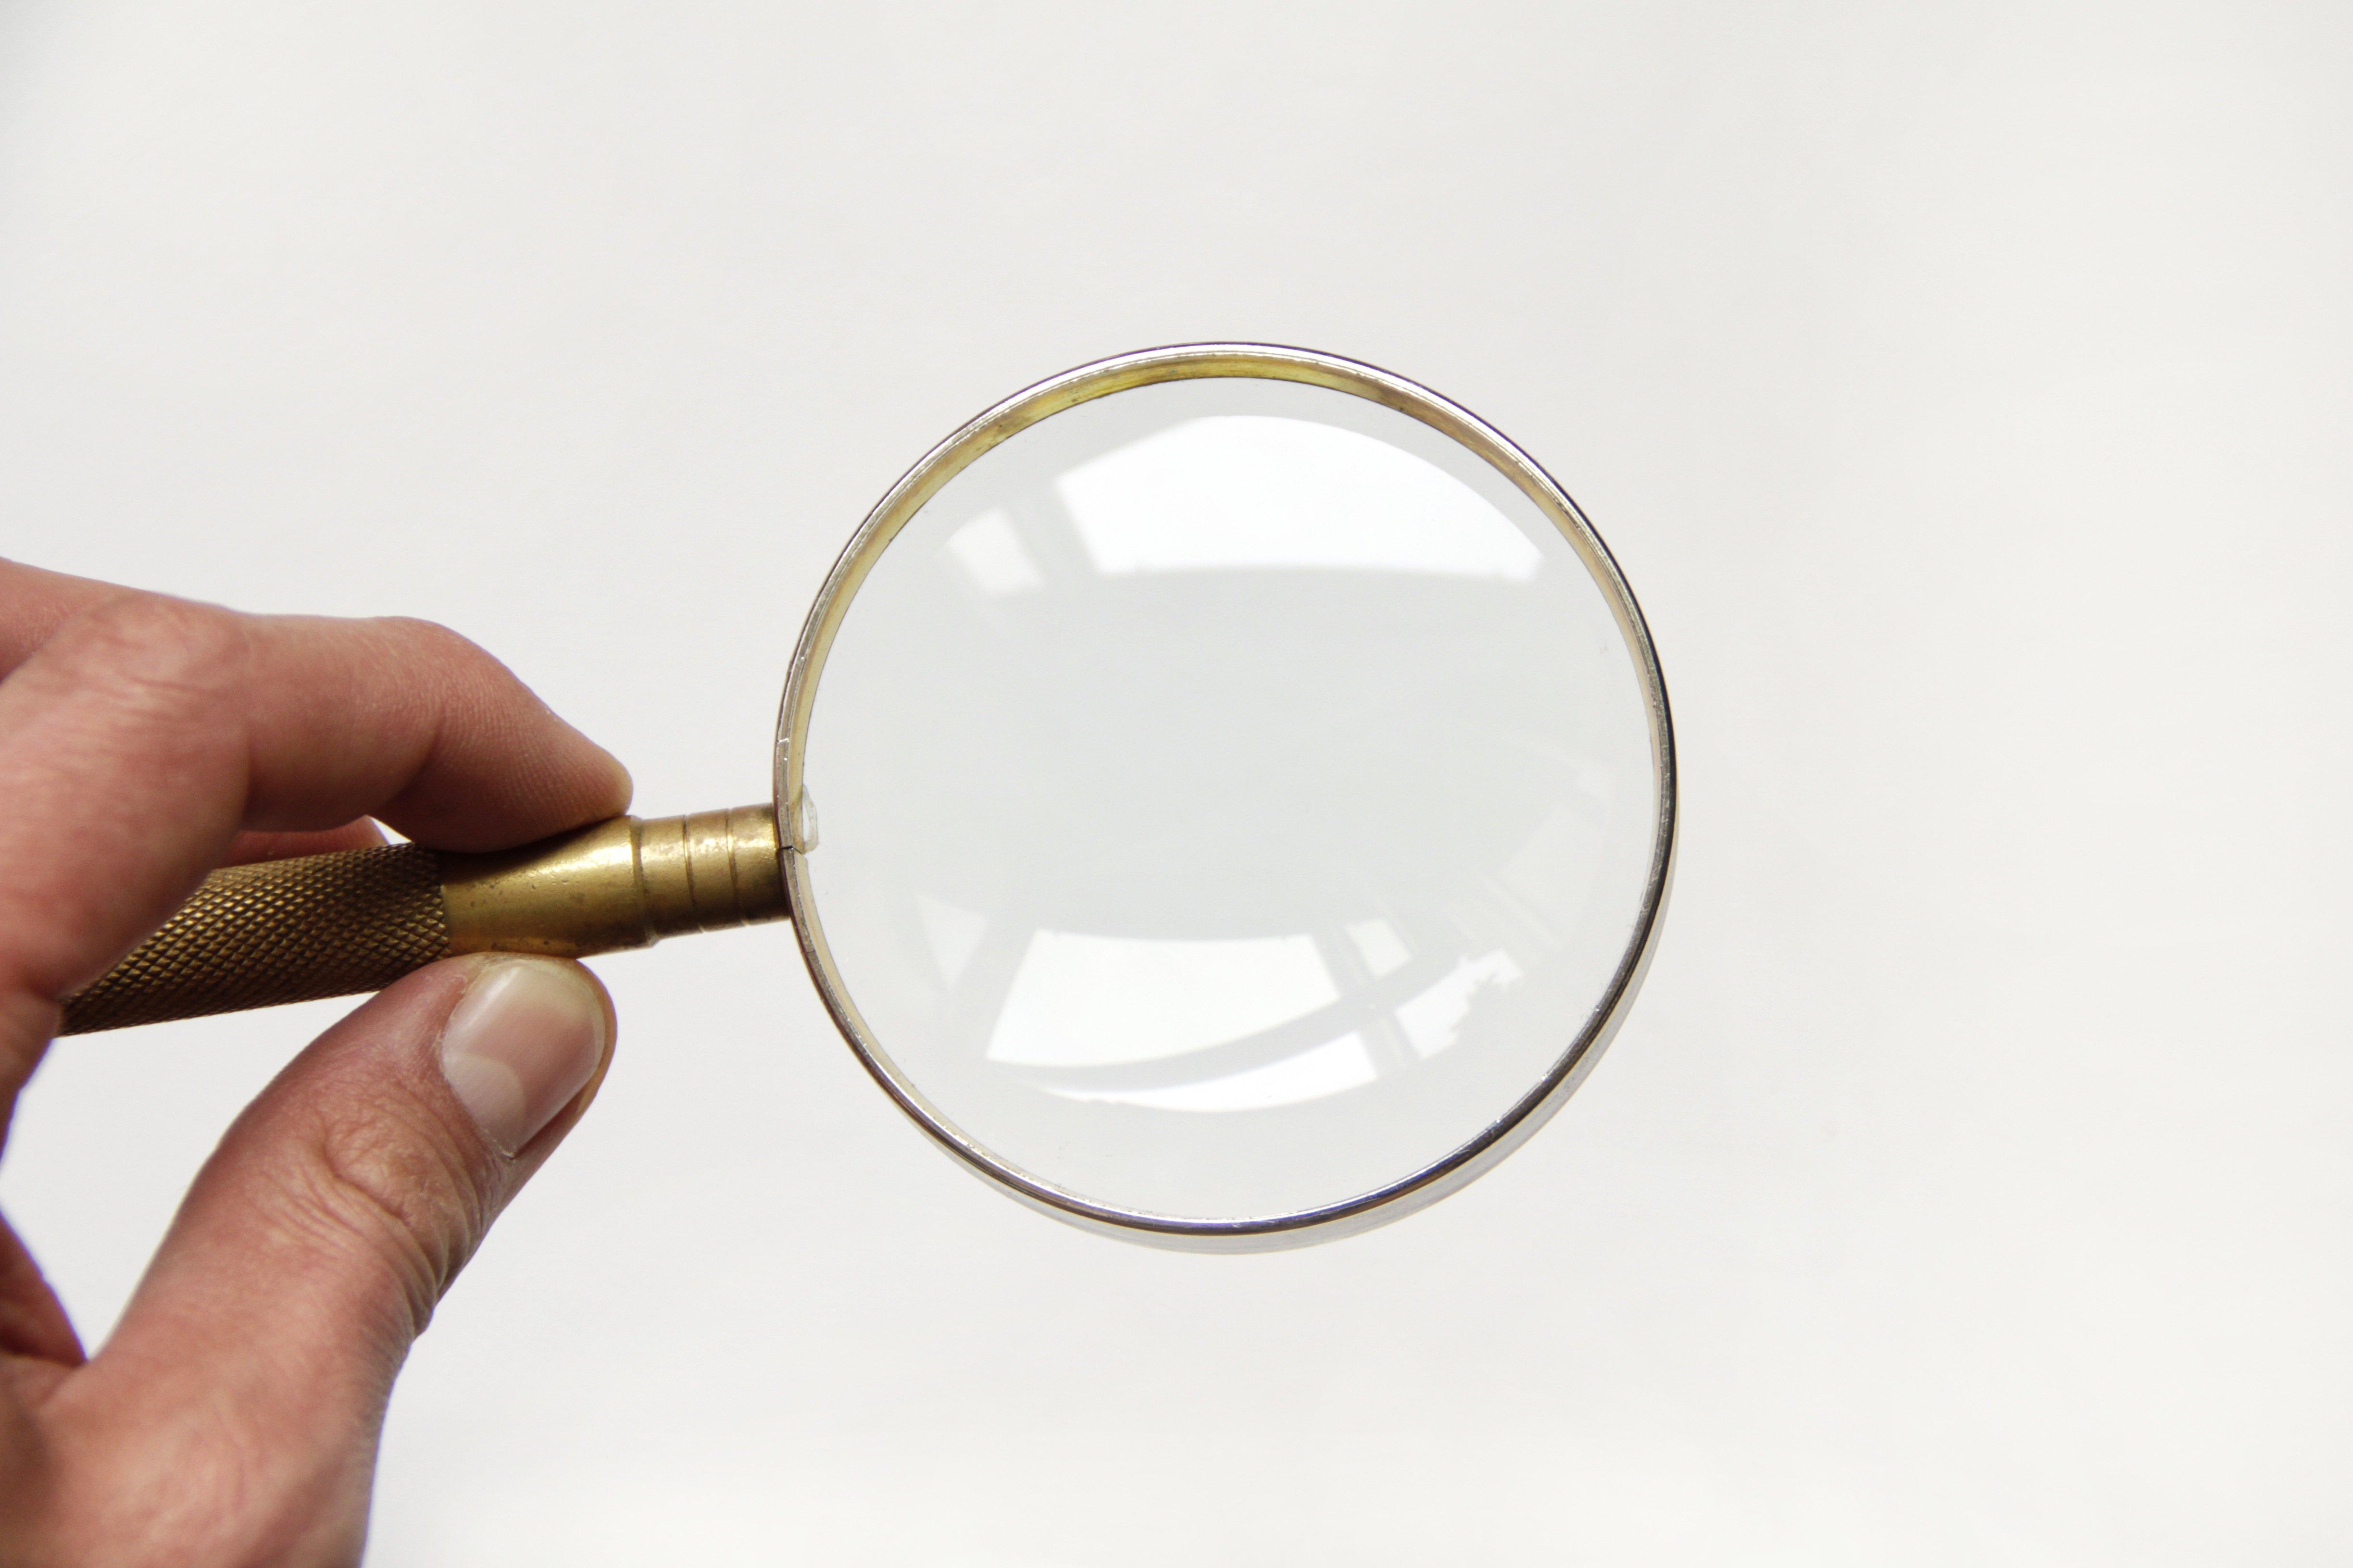 FDA CGMP Compliance for OTC Manufacturers